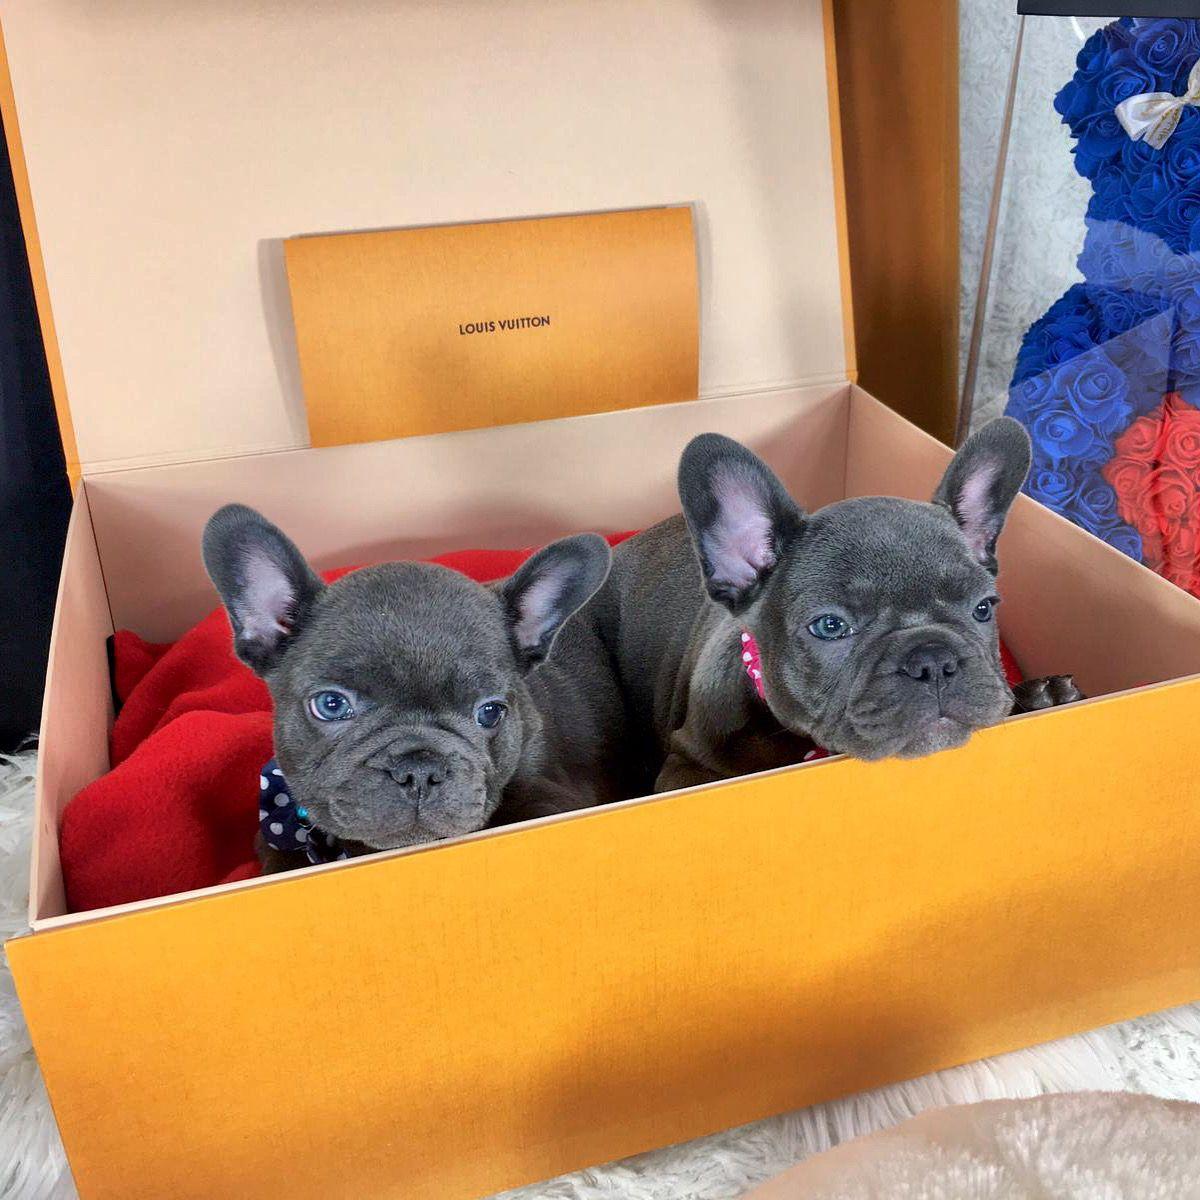 #Bulldogfrancese  #Frenchbulldog #frenchiemoments #bulldogfranceseitalia #frenchie #frenchielove #bulldogfrances #frenchieoftheday #frenchiegram #frenchbulldogs #bouledogue #dog #frenchielife #frenchiepuppy #frenchies1 #frenchbulldogpuppy